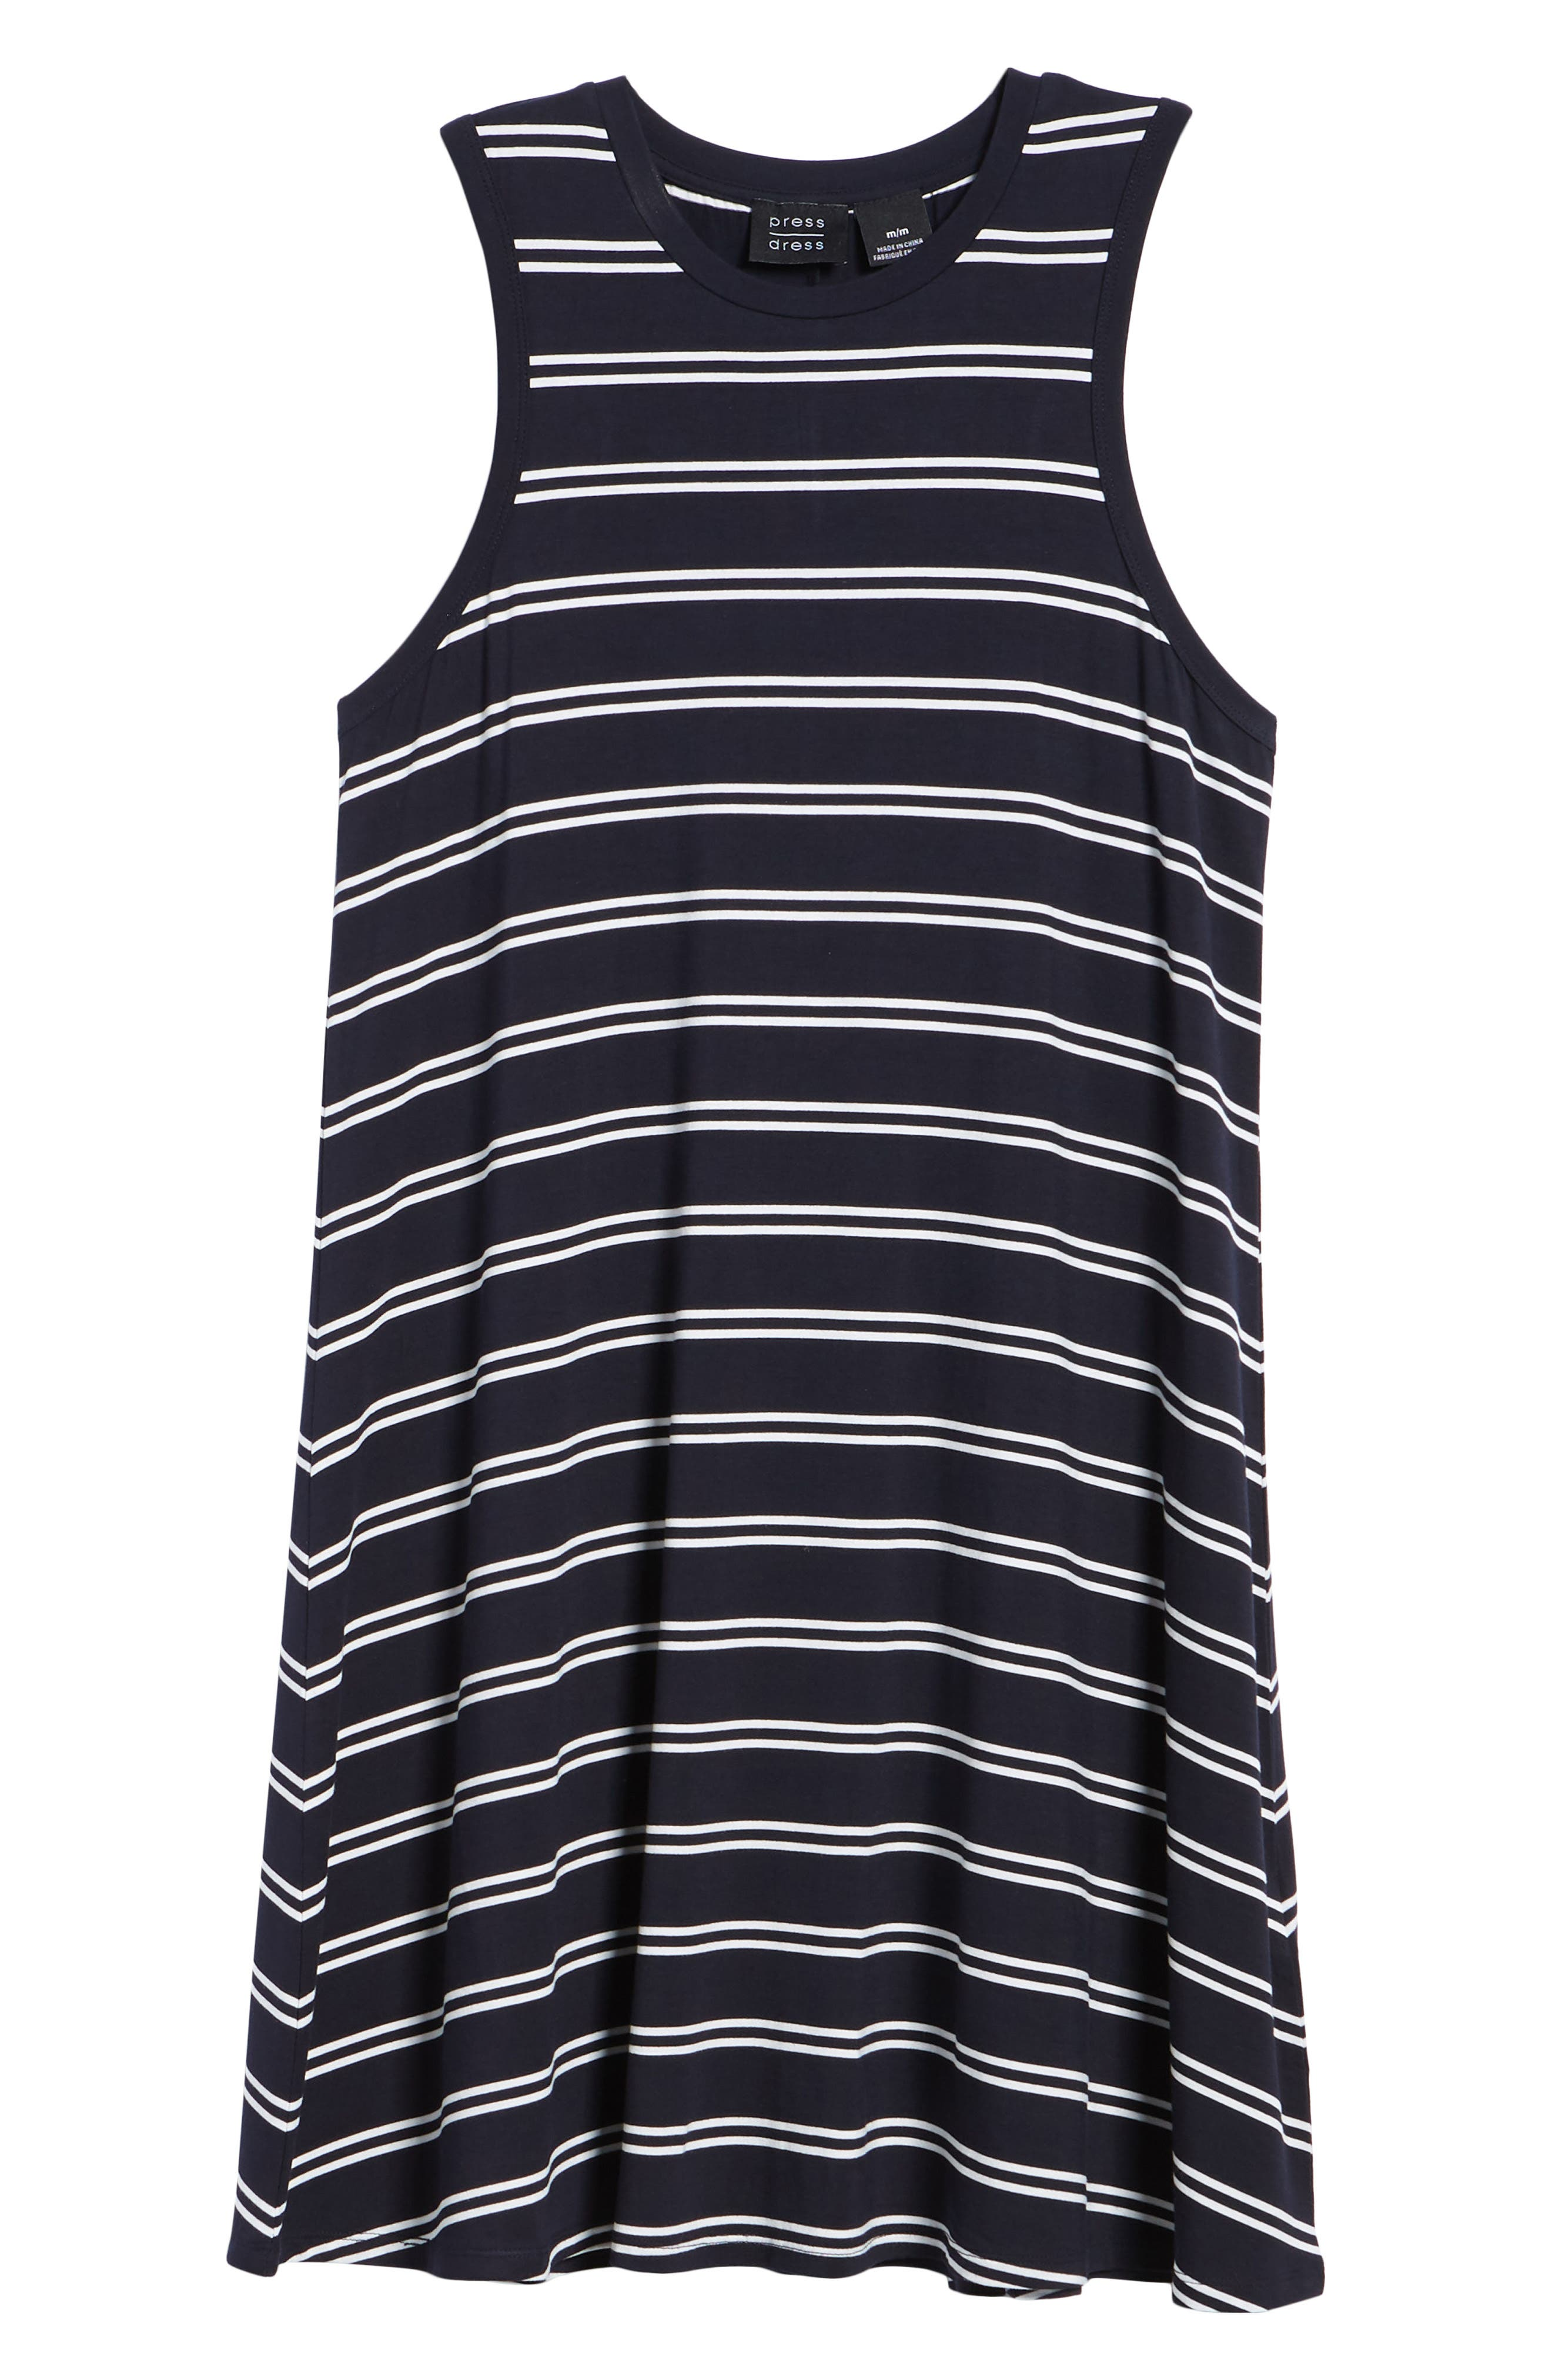 Stripe Tank Dress,                             Alternate thumbnail 7, color,                             Deepest Navy White